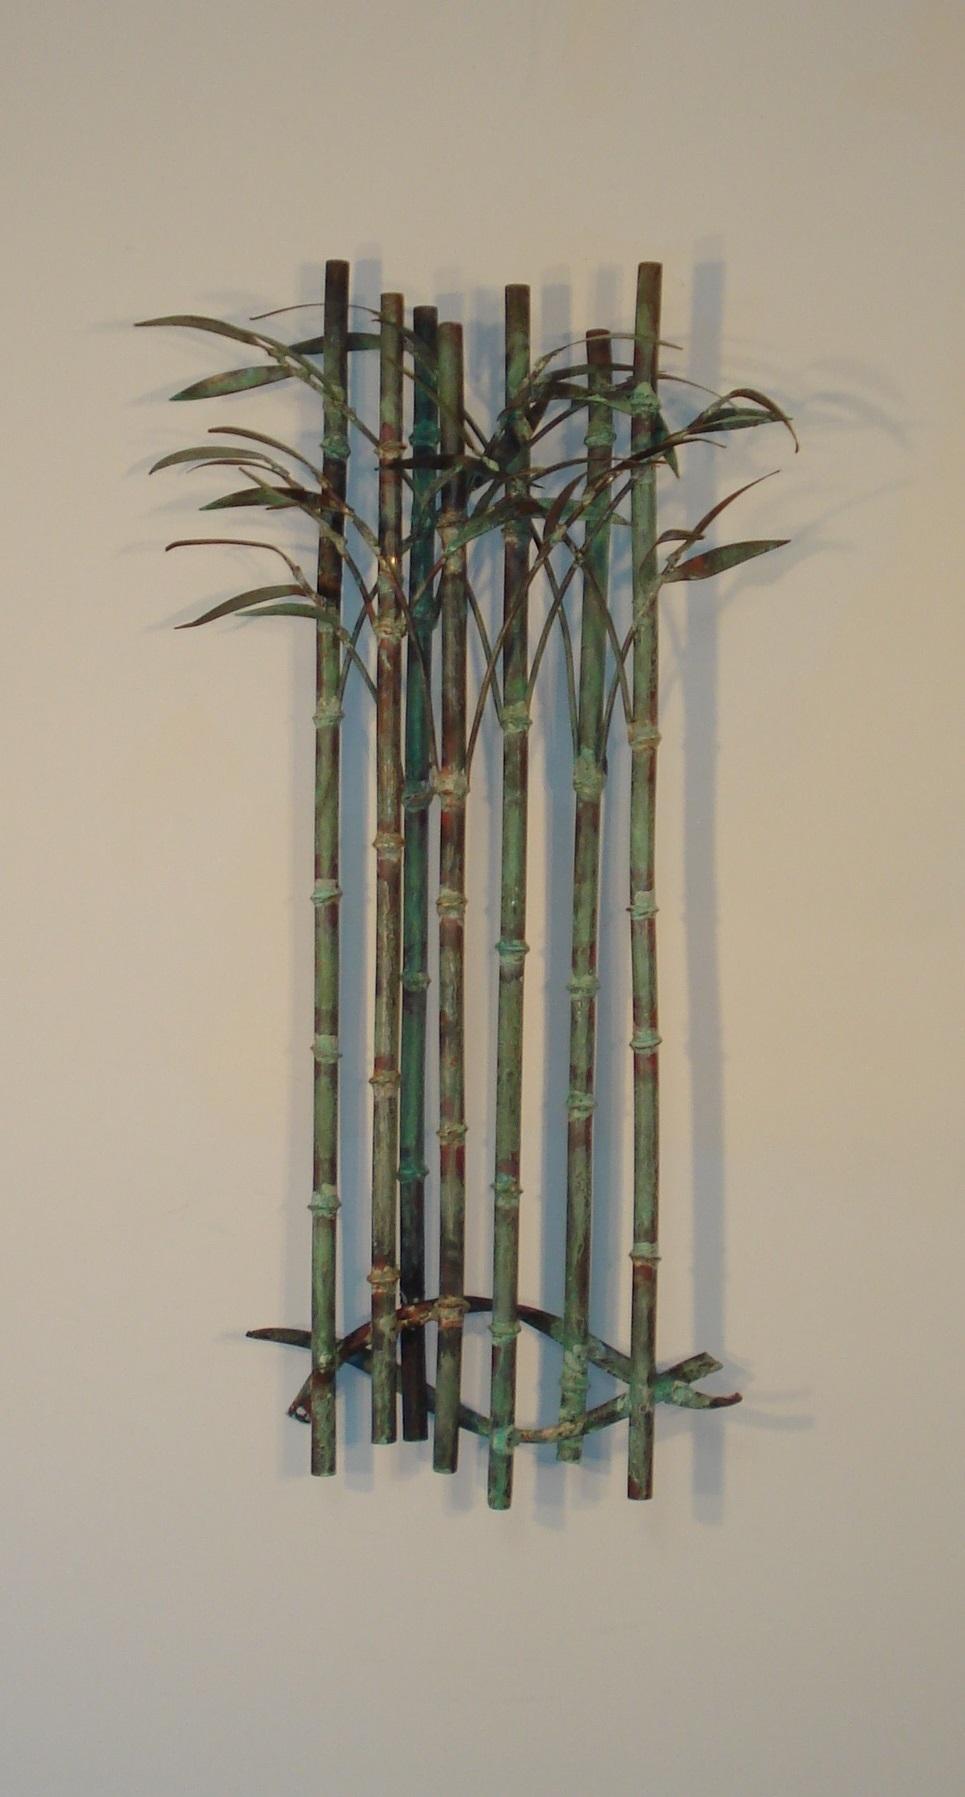 Outdoor metal wall art metal wall sculpture metal for Bamboo wall art